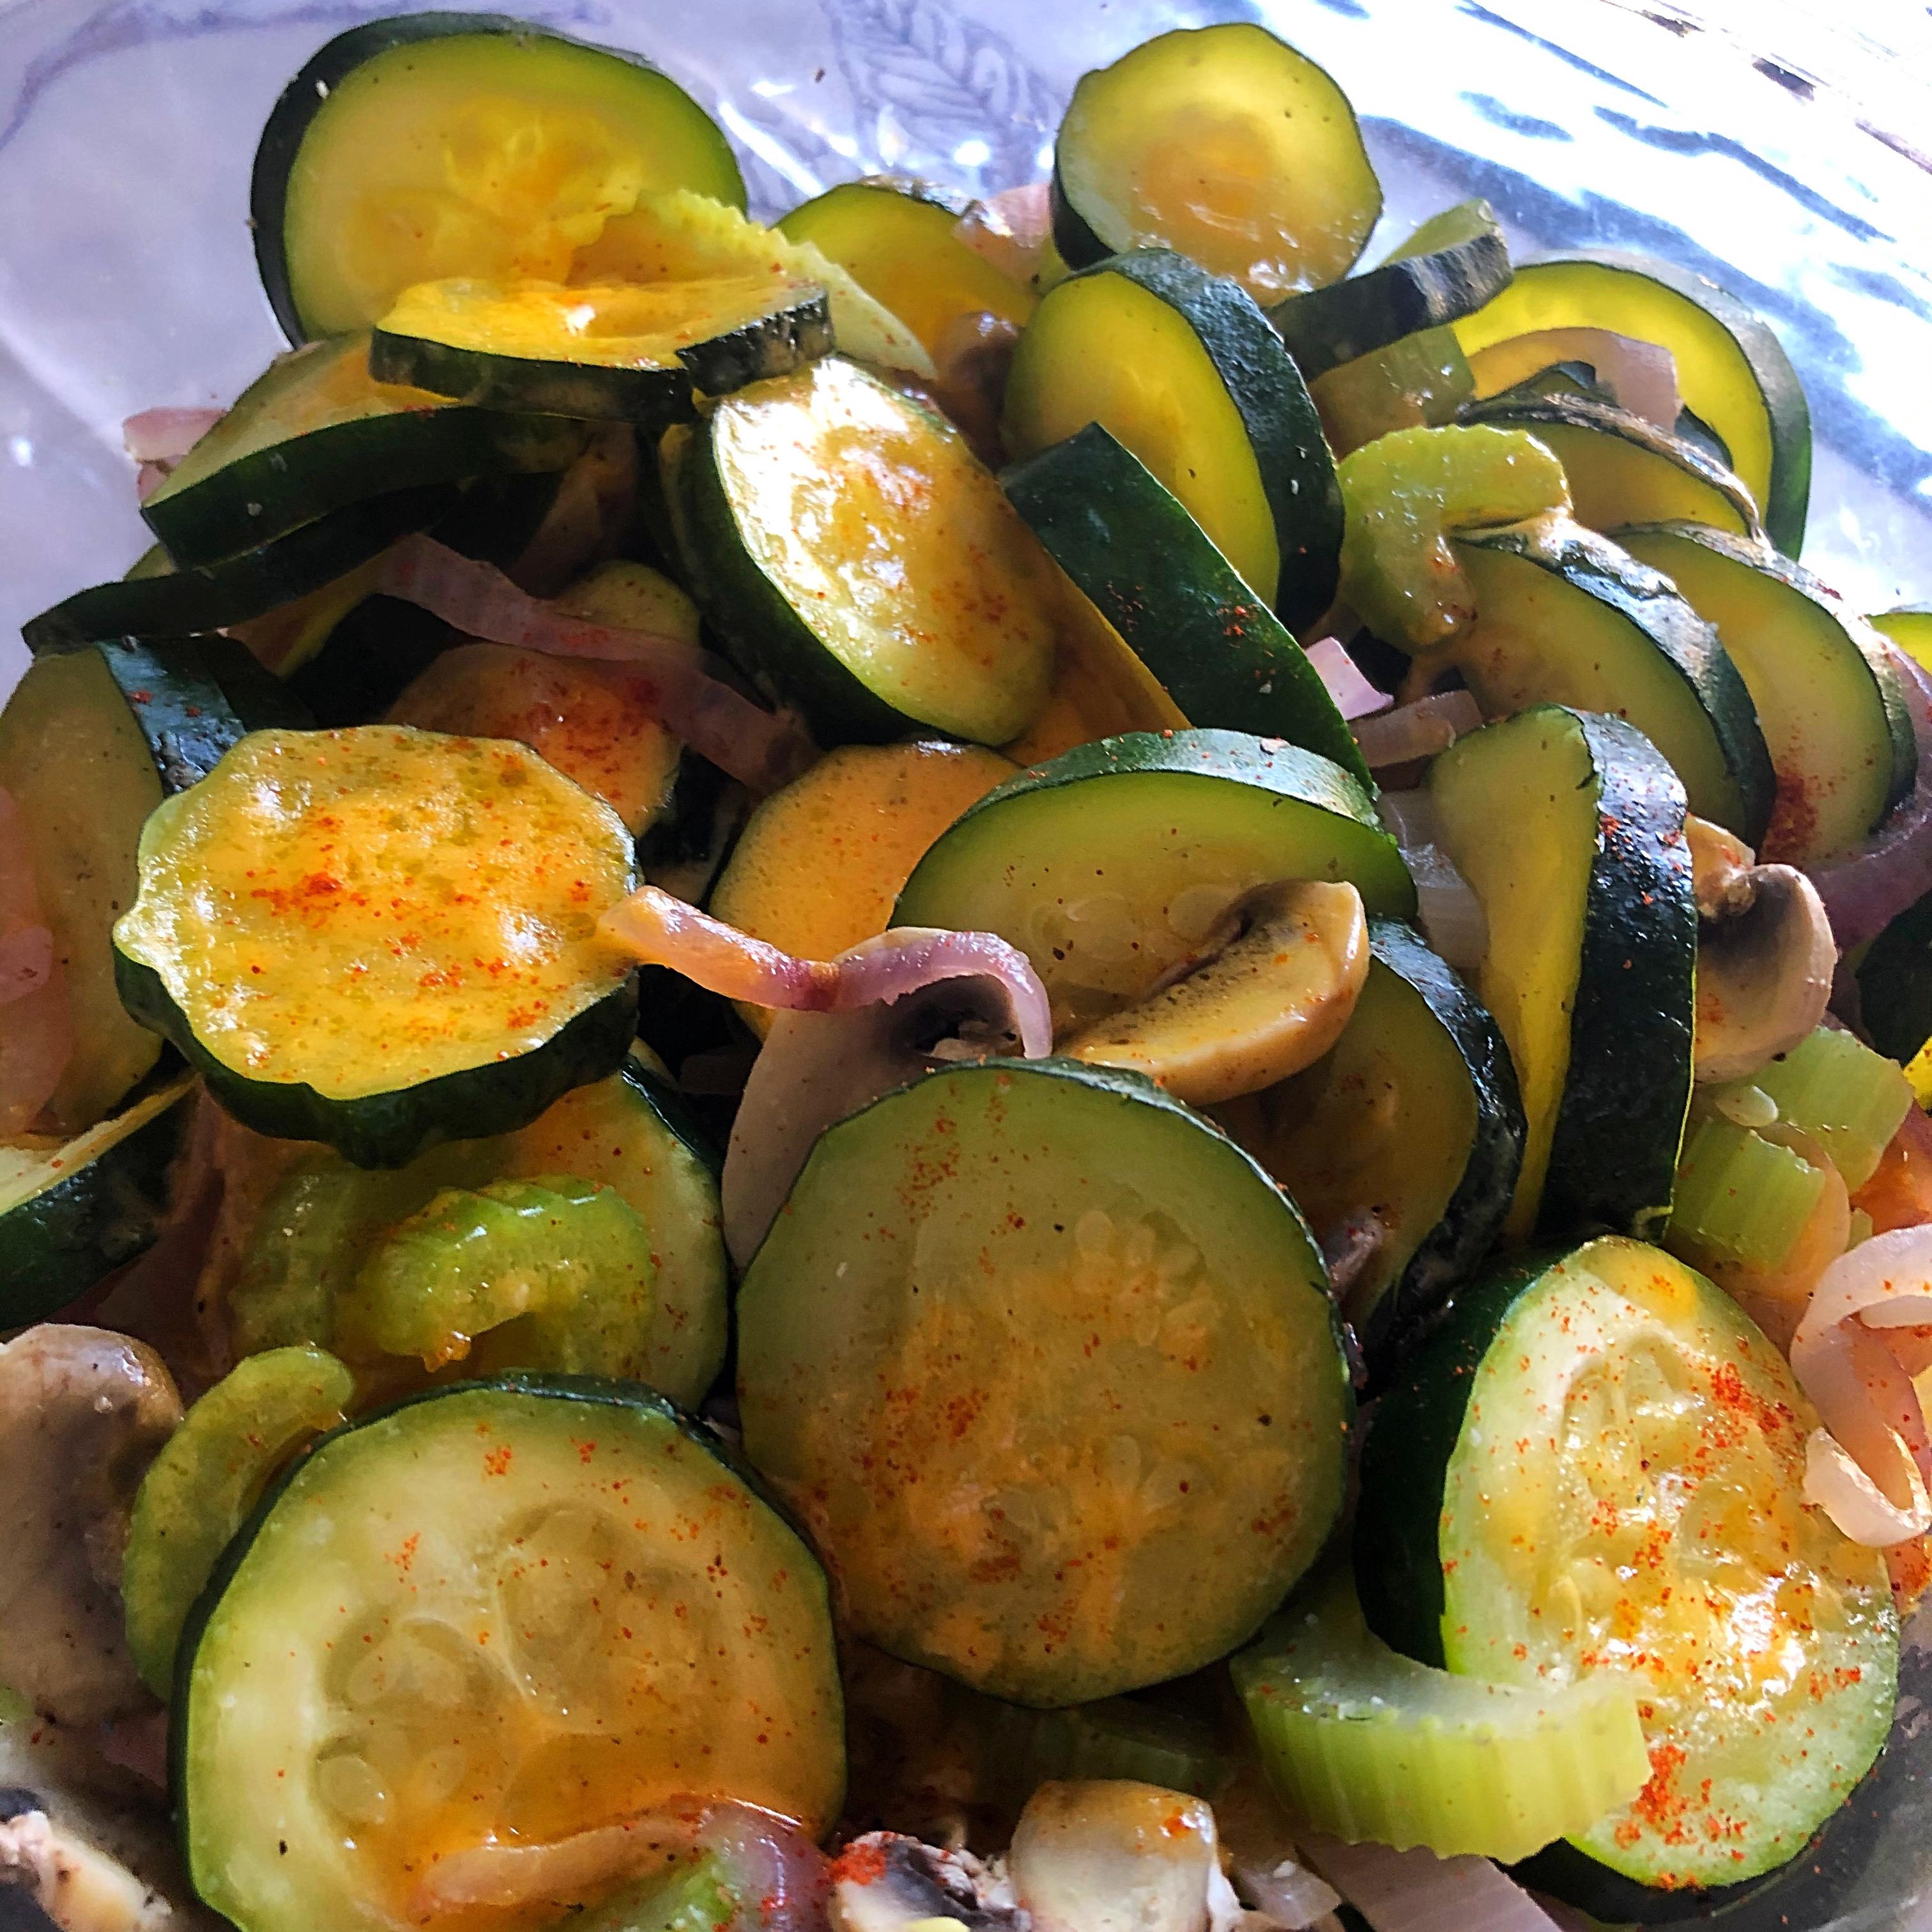 Steamy Microwave Zucchini Sstef